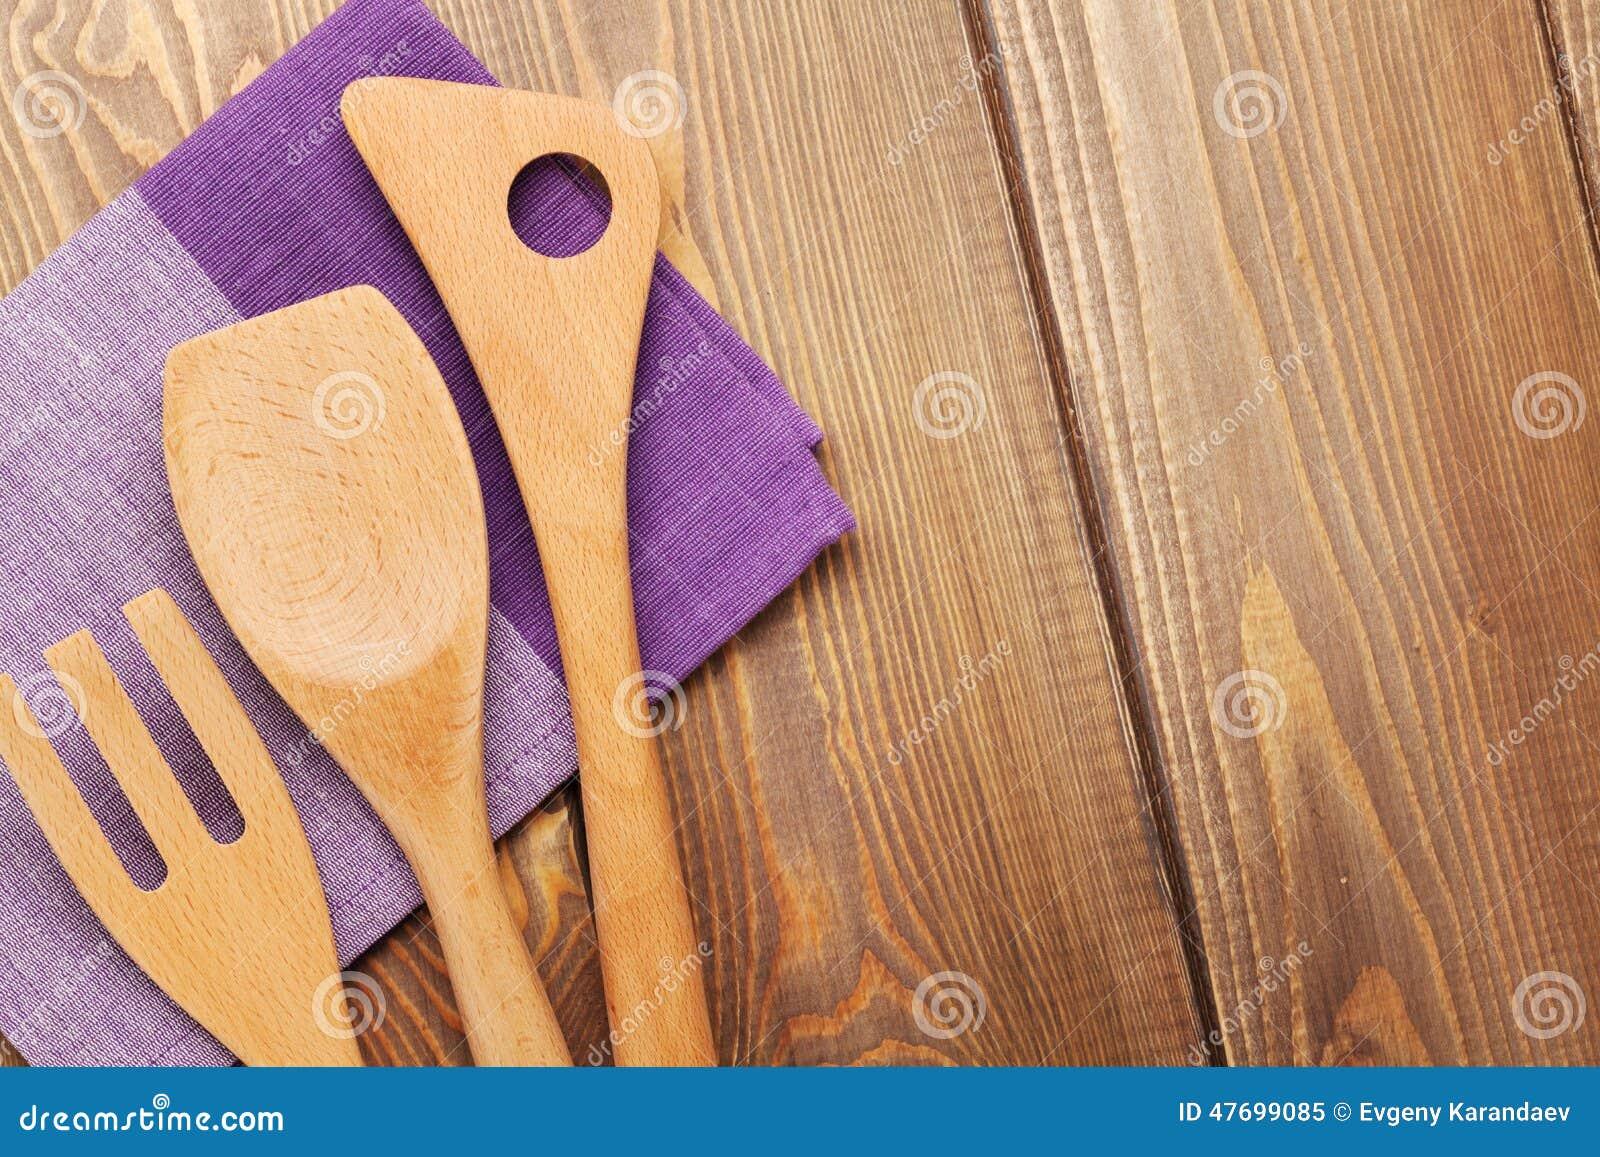 Wood kitchen utensils over wooden table background stock for Table utensils